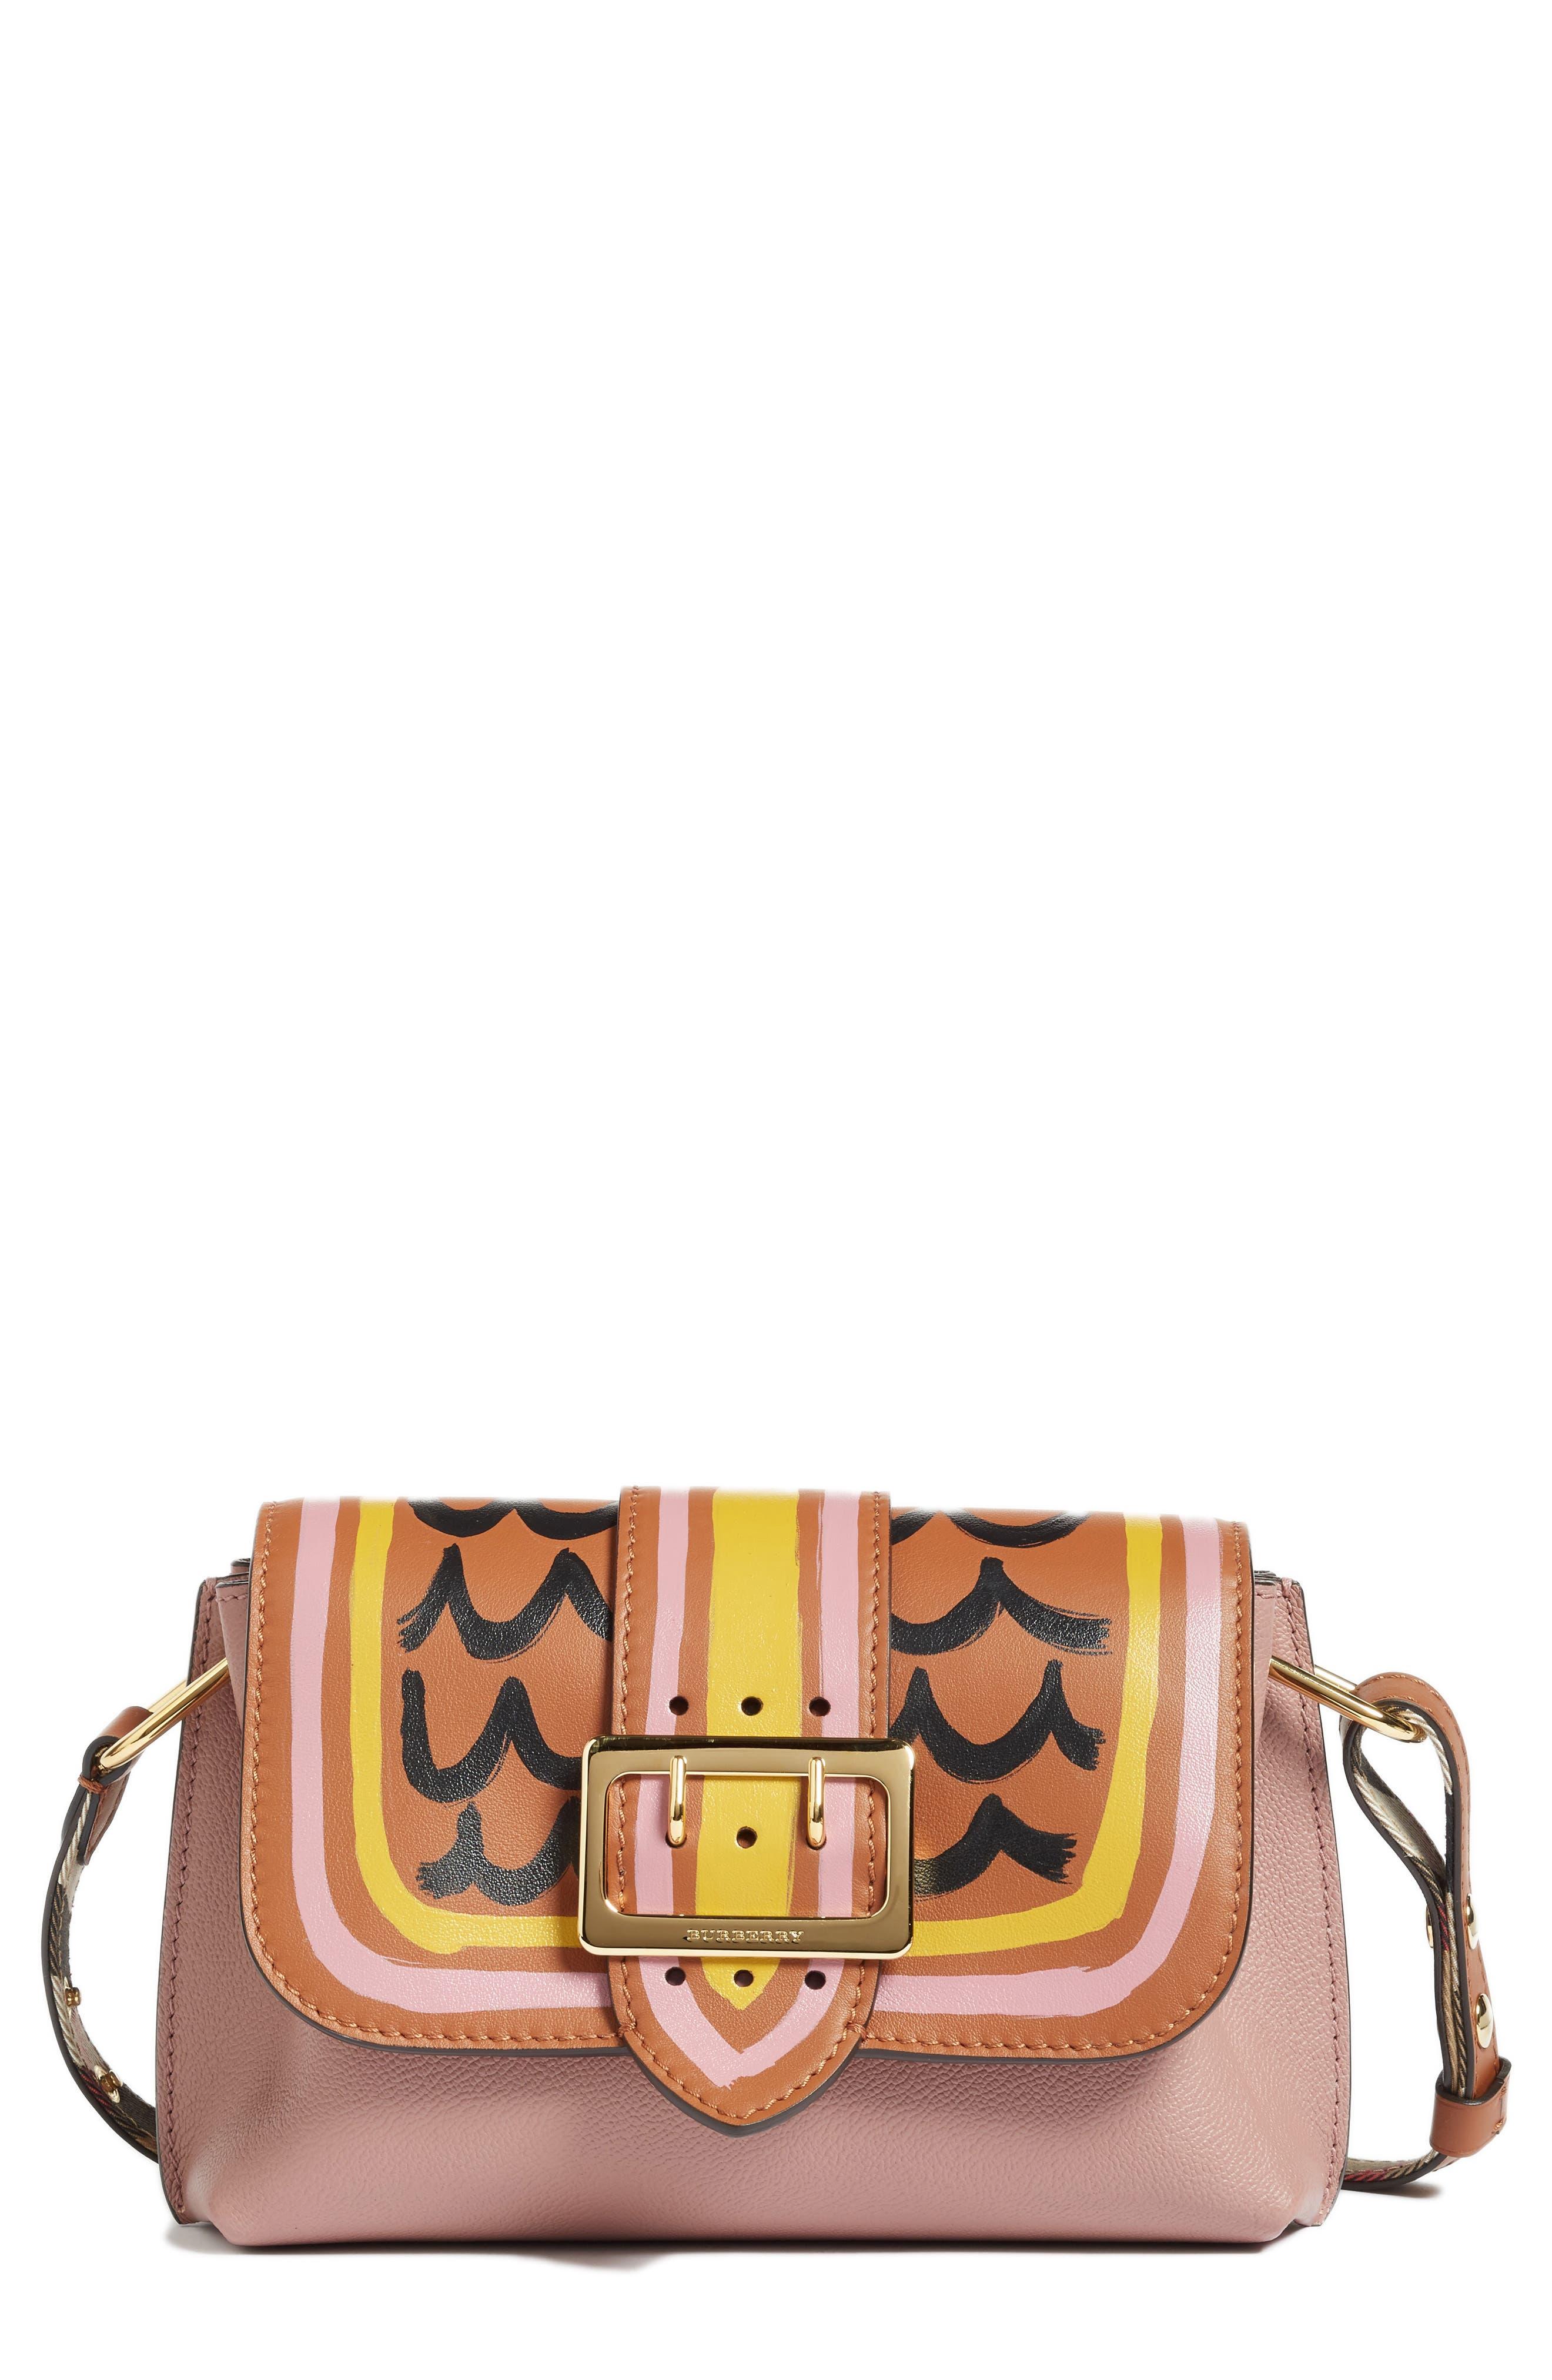 BURBERRY Small Medley Shoulder Bag